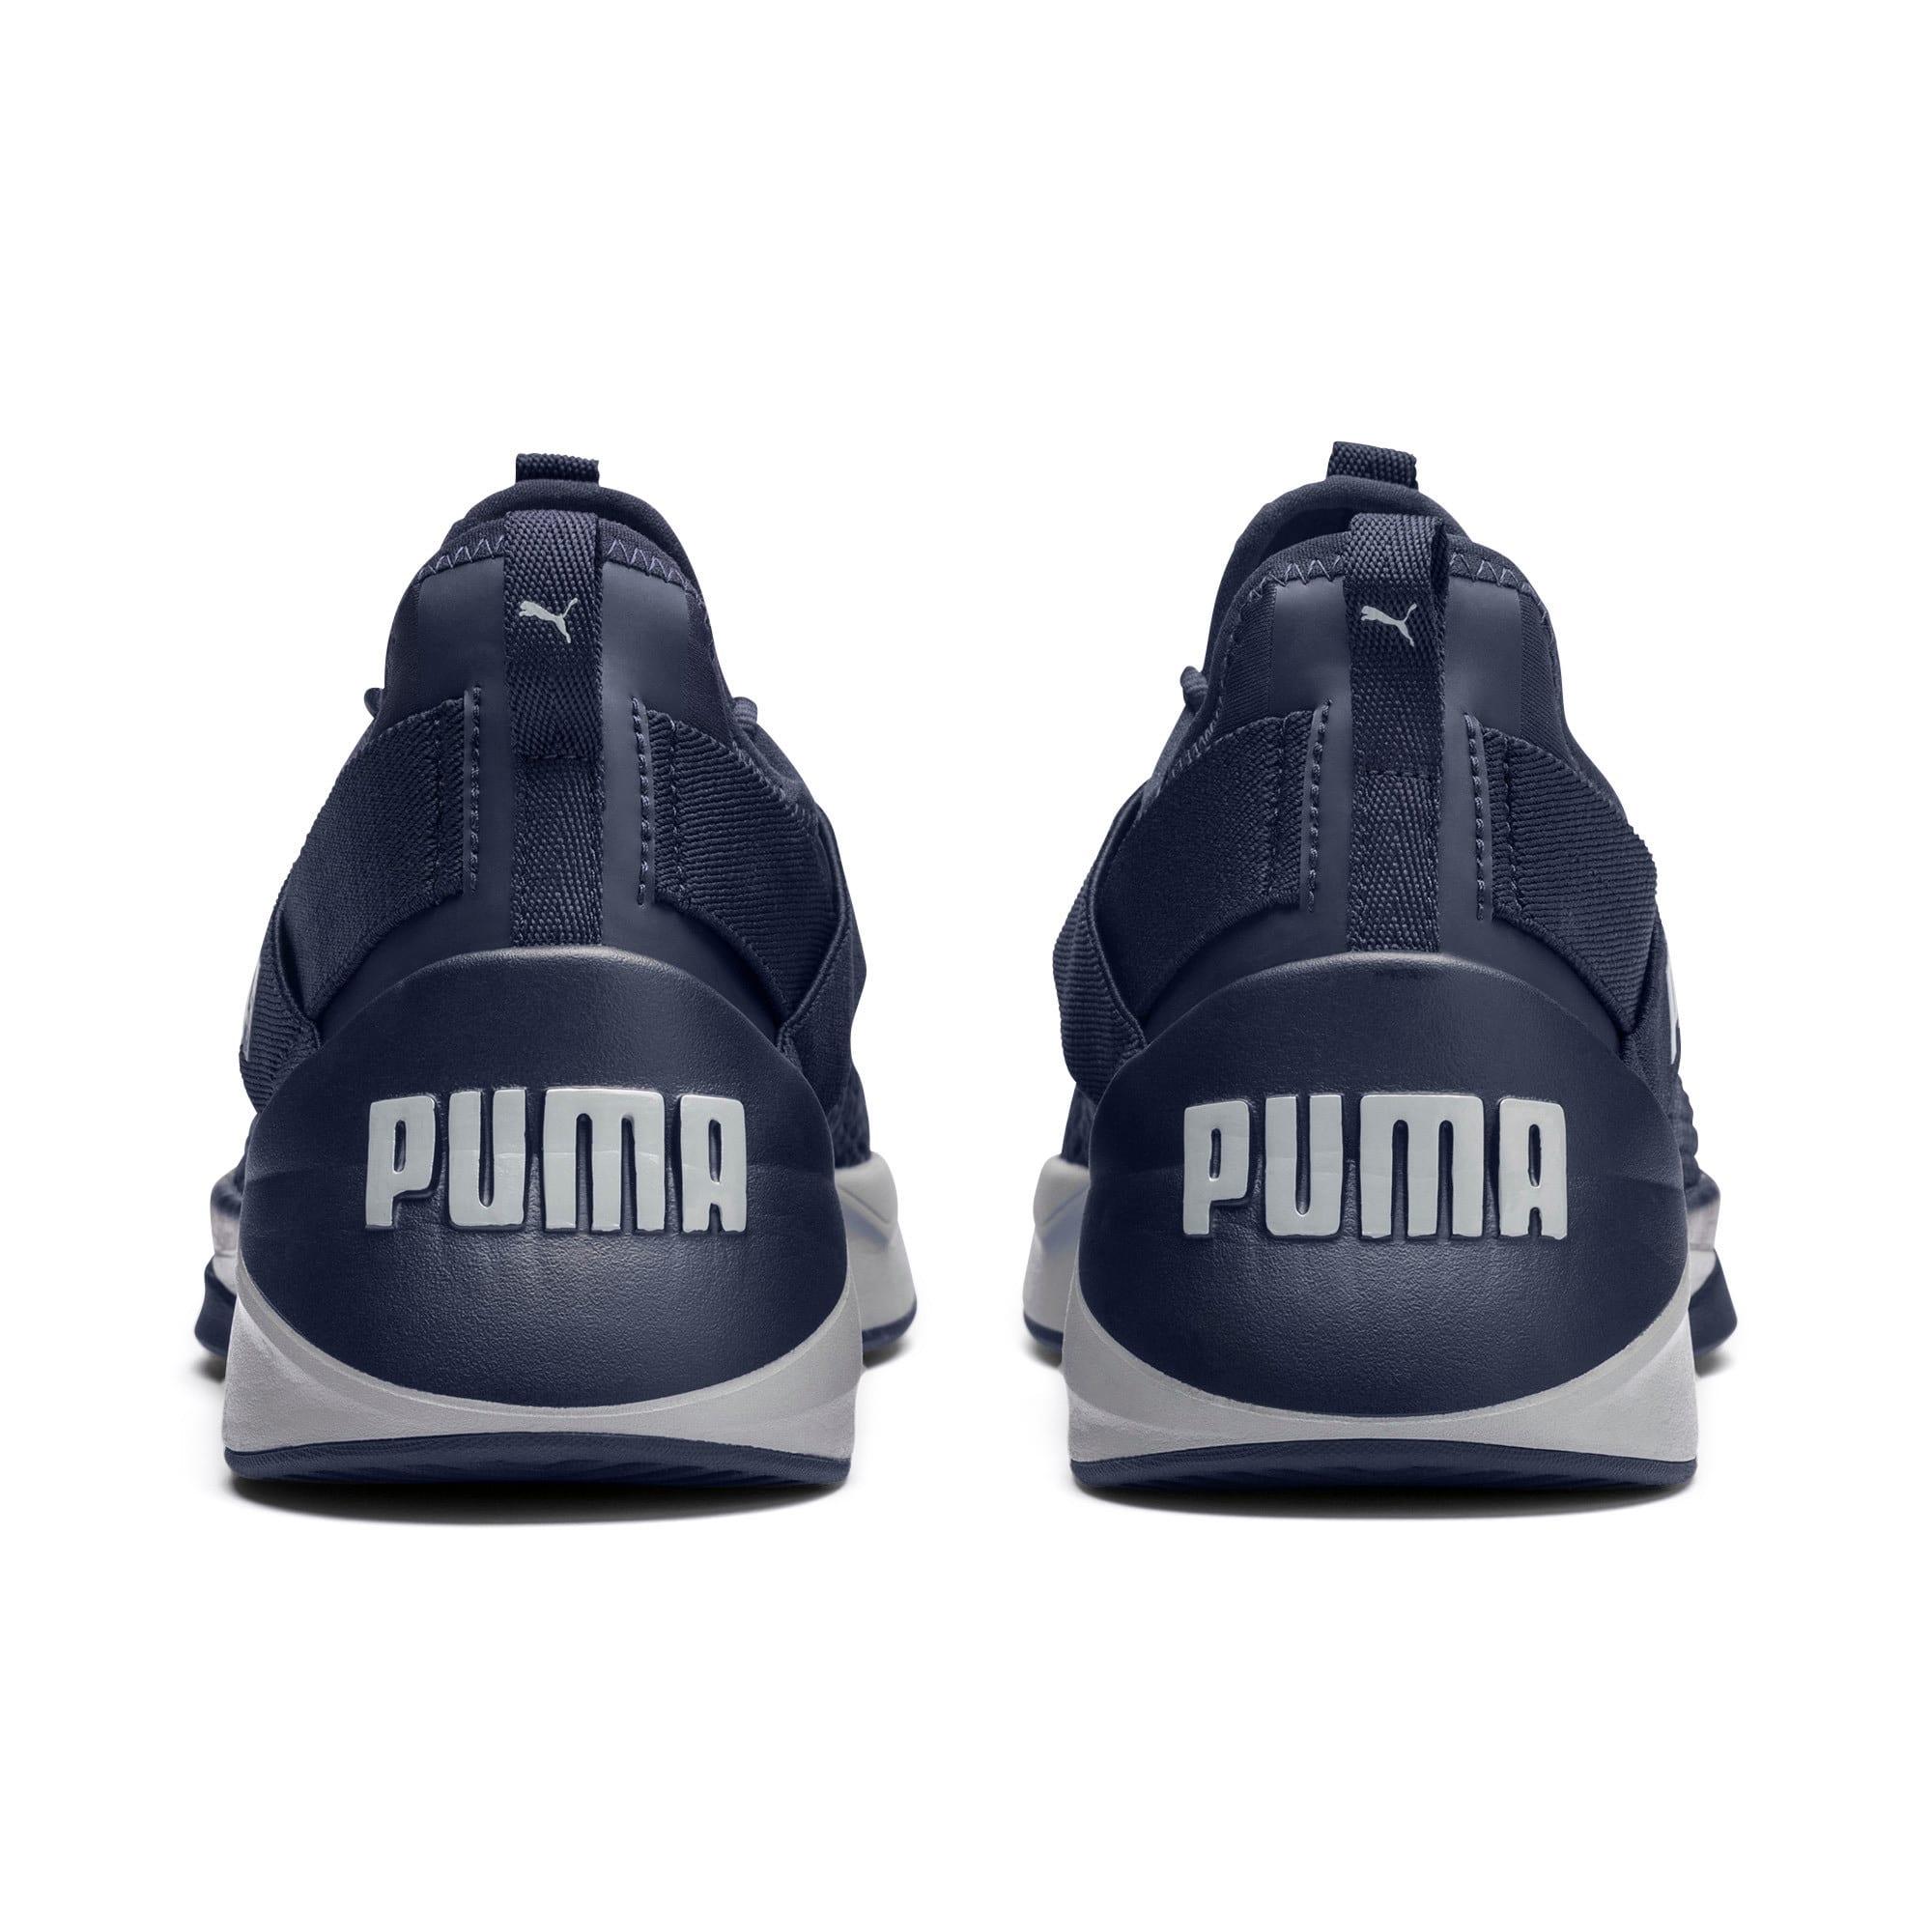 Thumbnail 4 of Jaab XT Men's Training Shoes, Peacoat-Quarry, medium